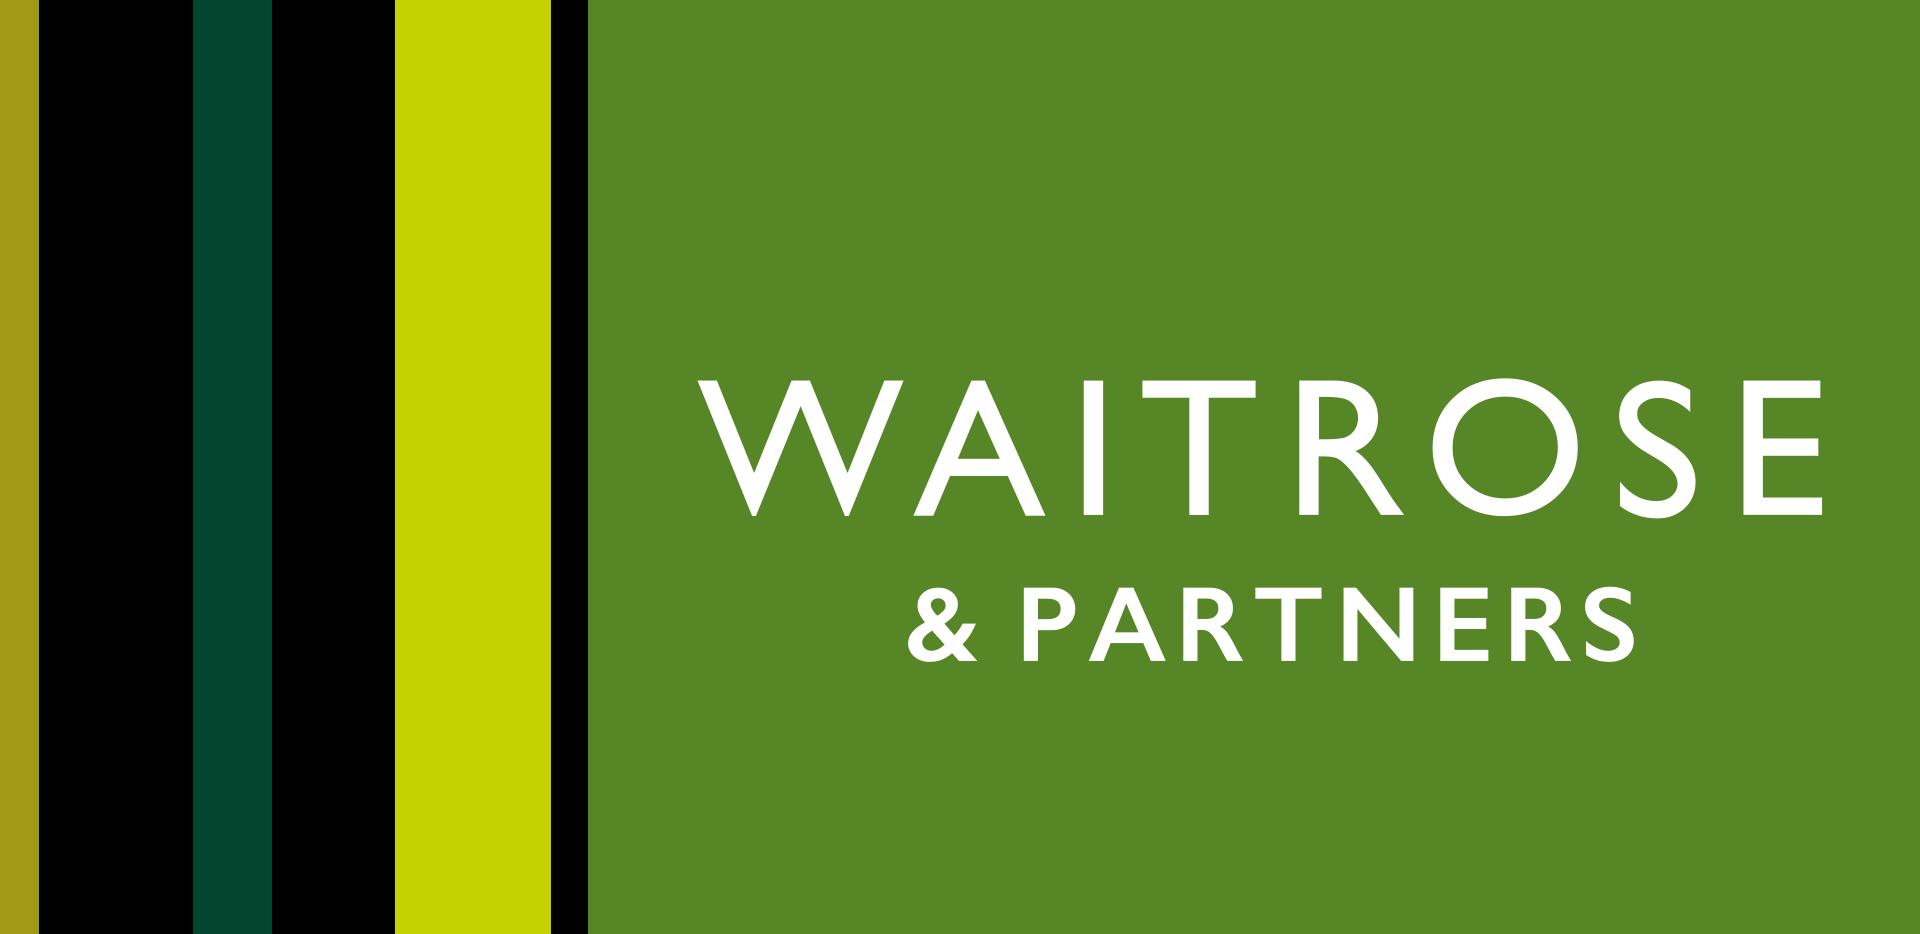 Buy at Waitrose